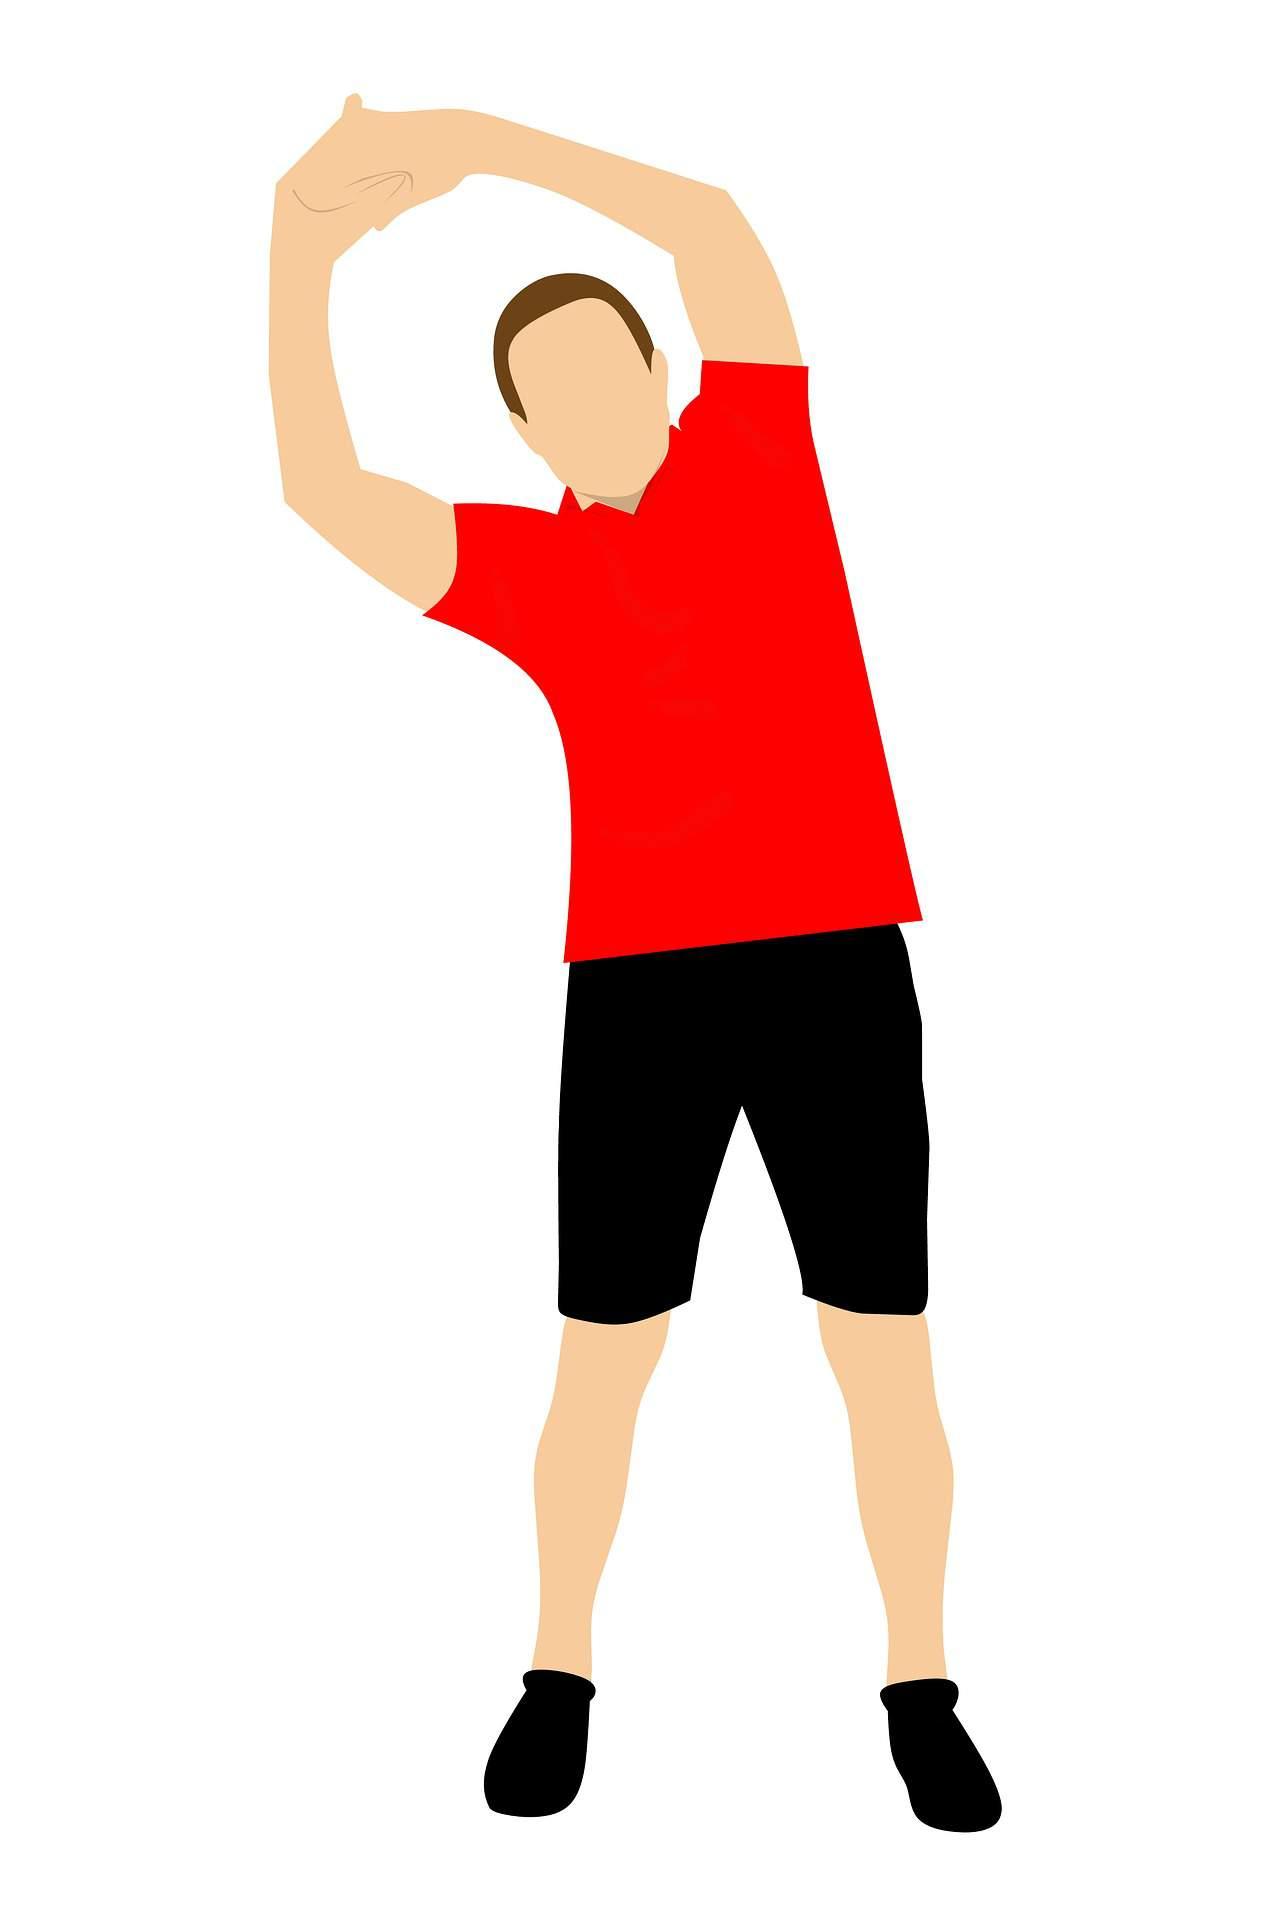 Soreness After Chiropractic Adjustment